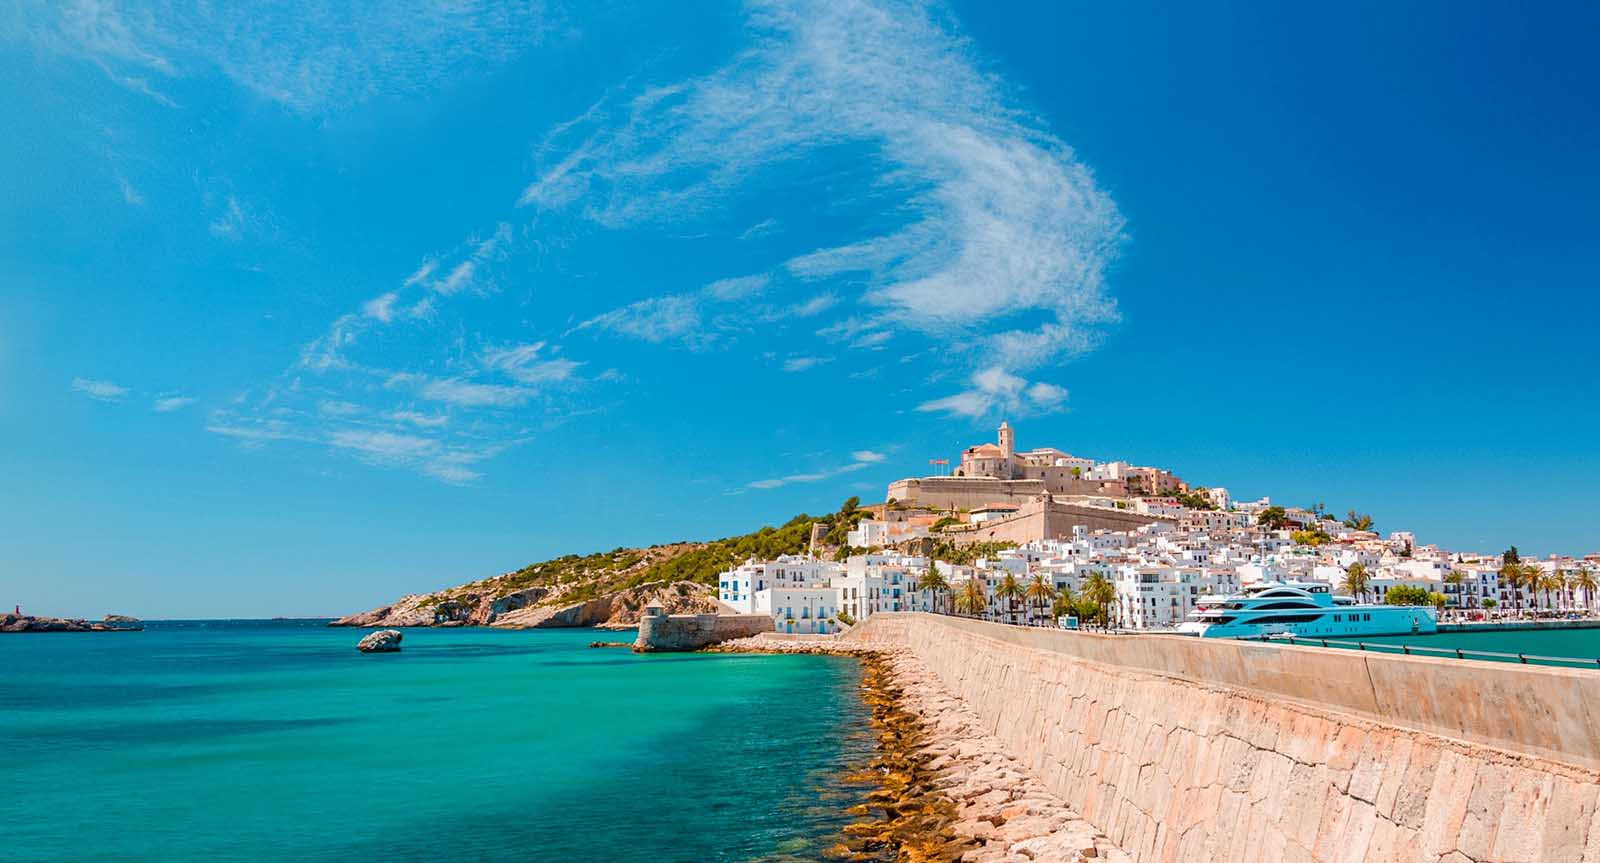 Short break in Ibiza filled with nature & fun